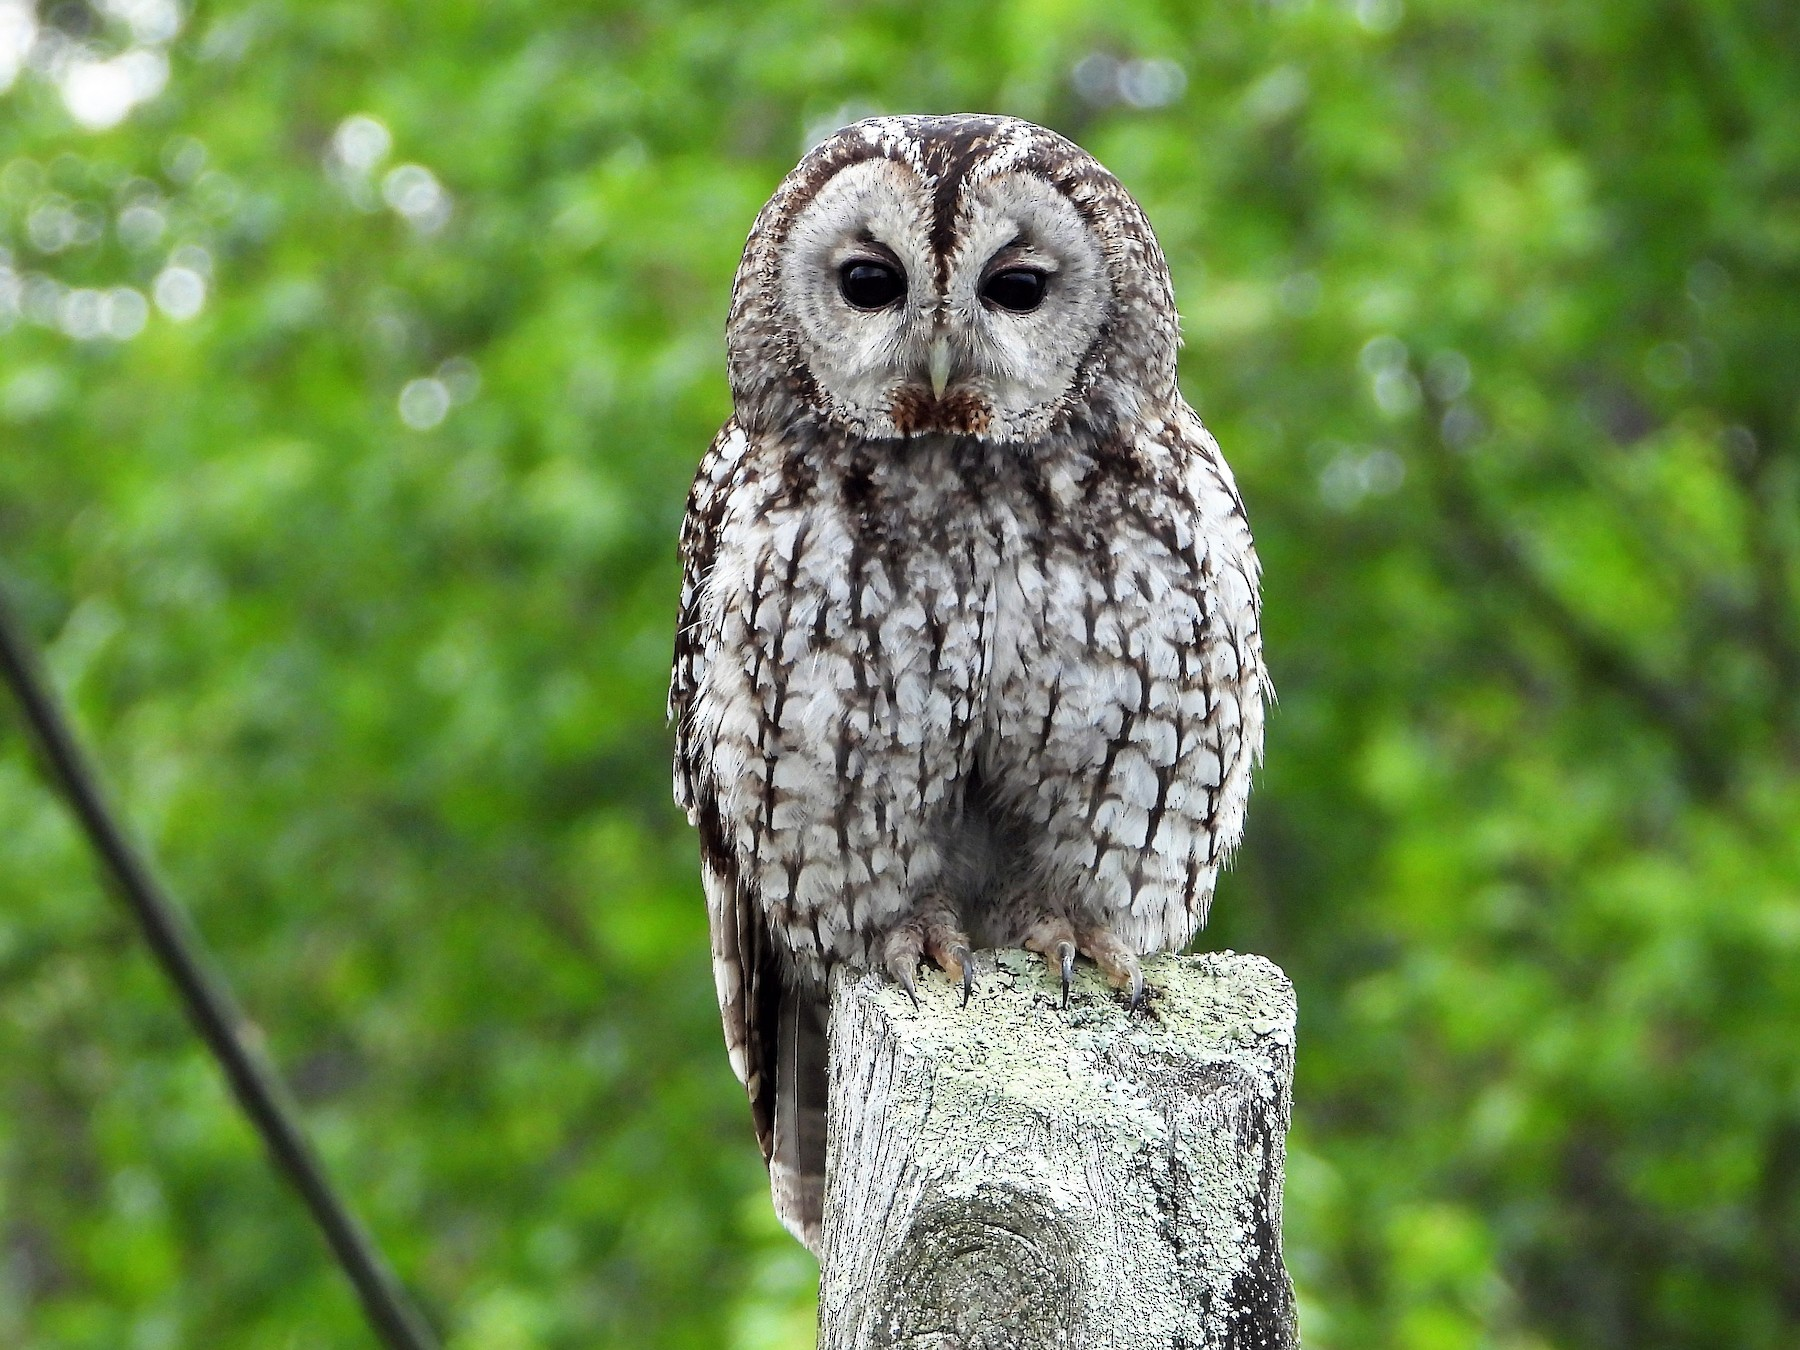 Tawny Owl - J. Alfonso Diéguez Millán